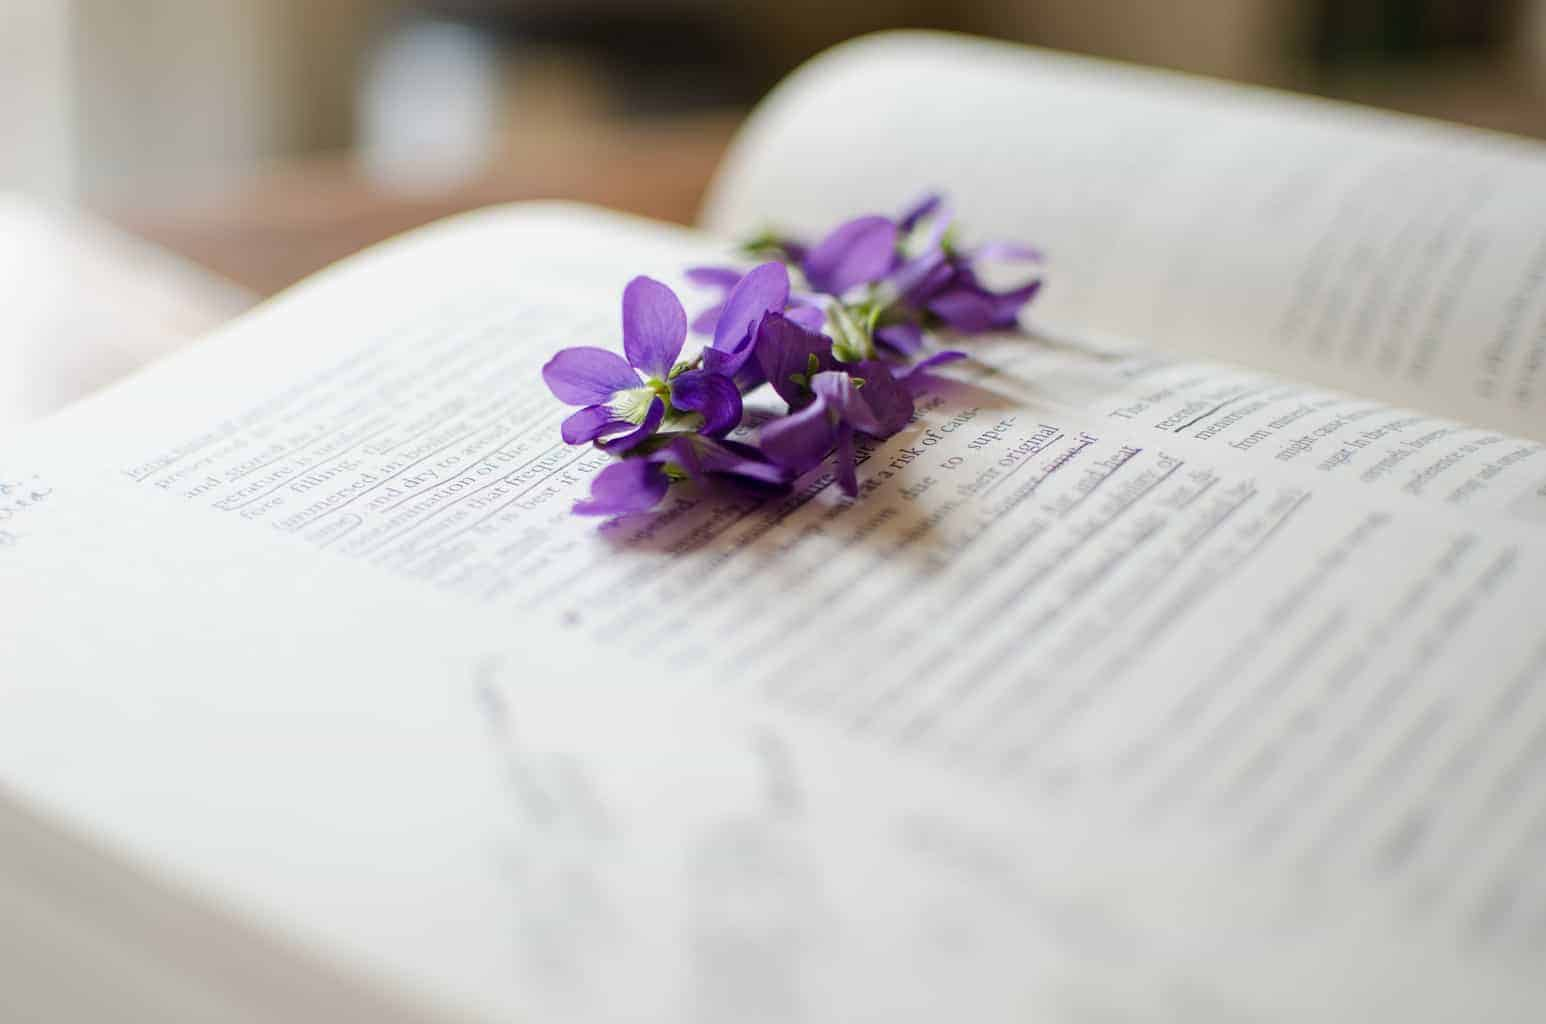 Herbal Remedies Aren't God